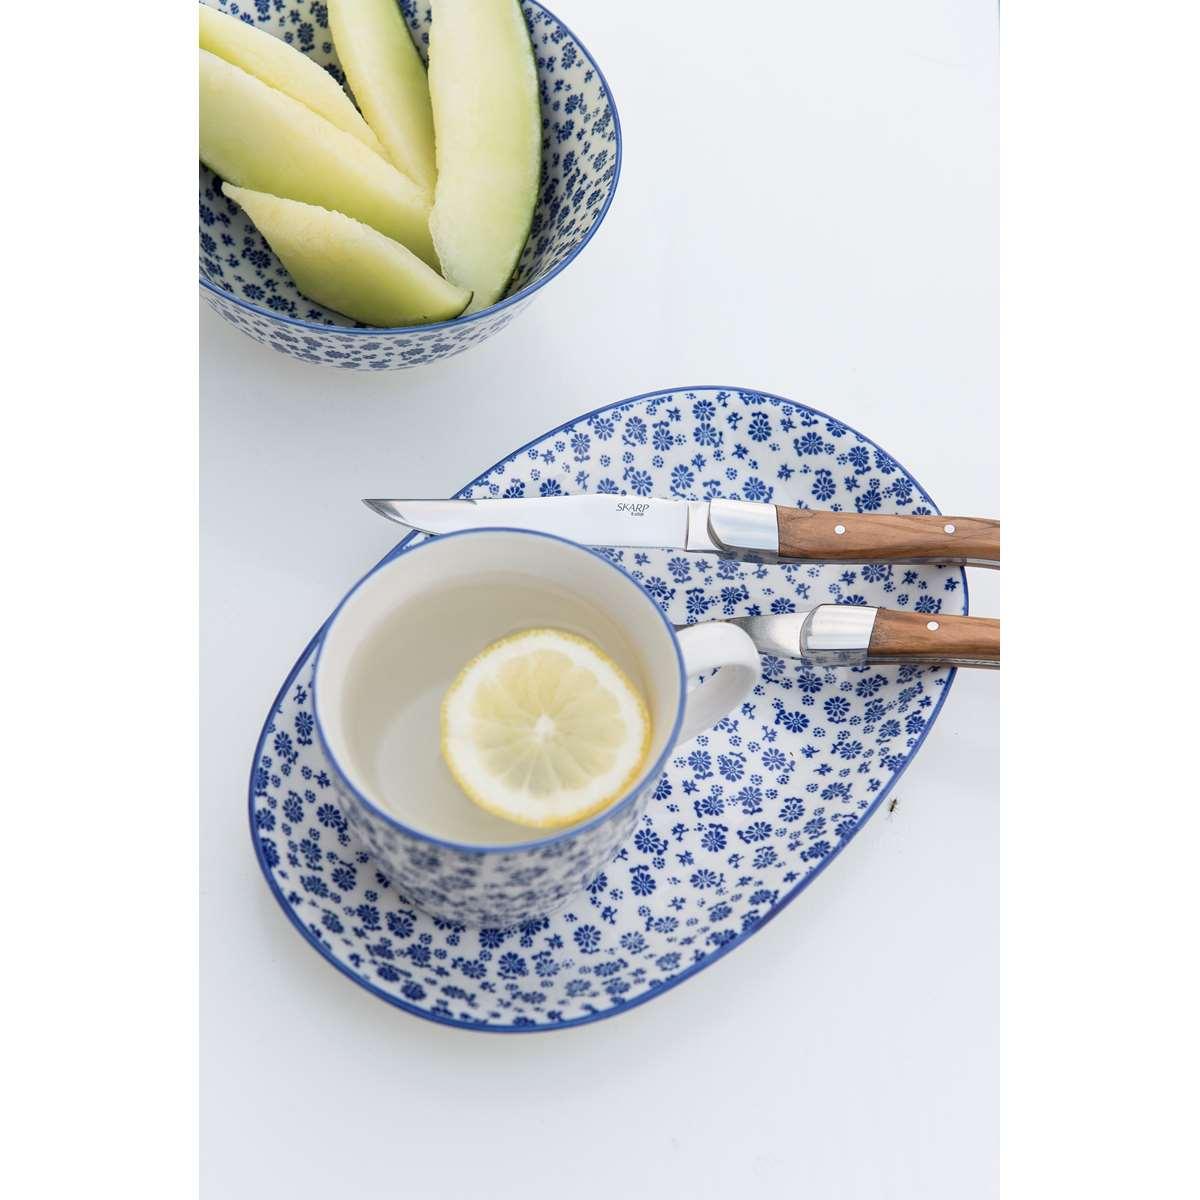 Cuchillo mango de madera